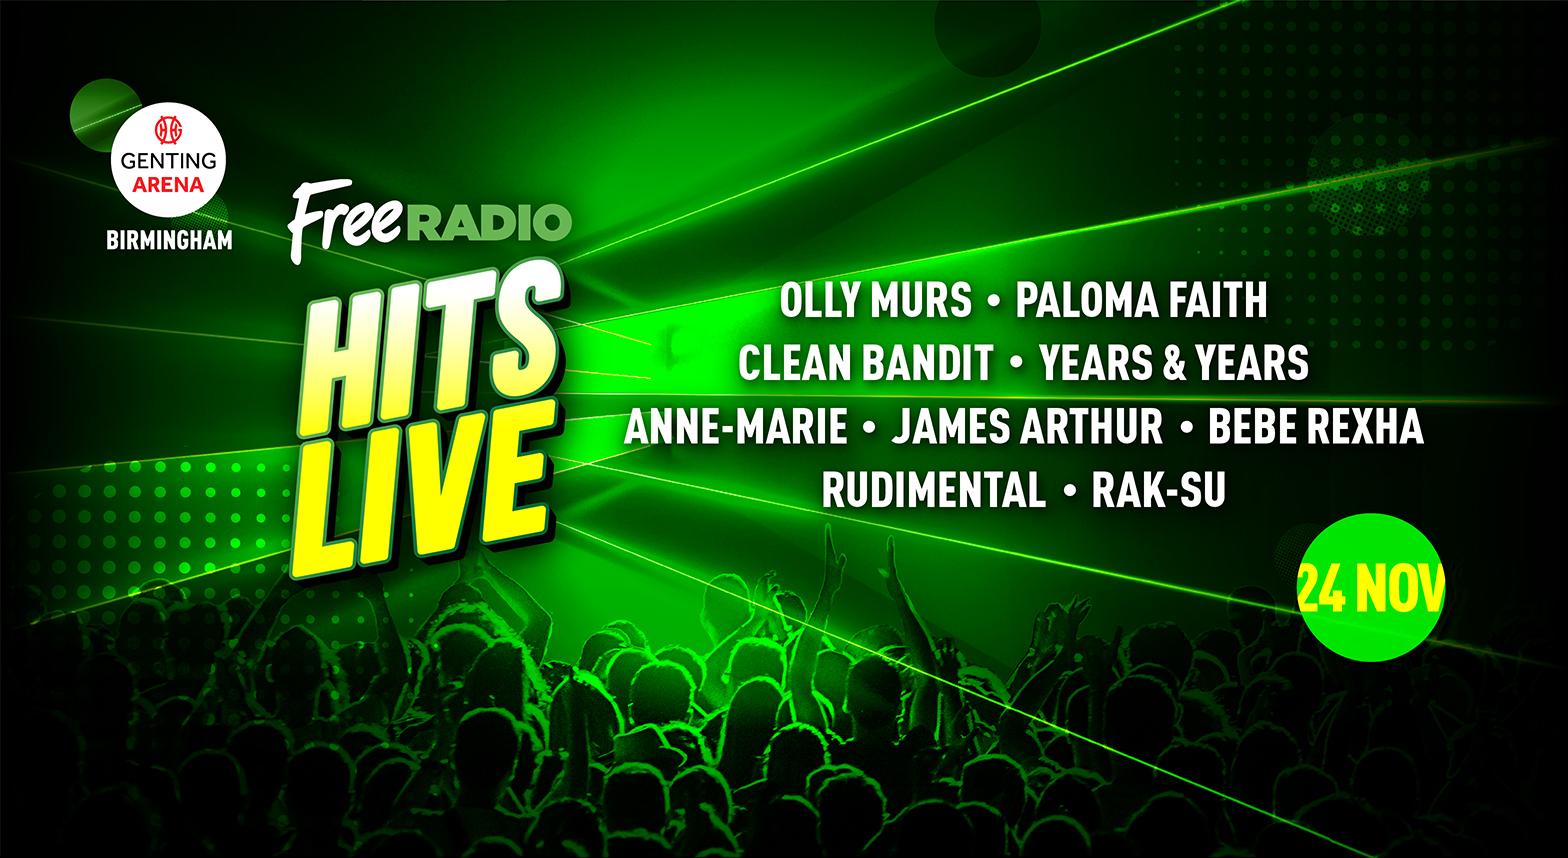 free radio live 2018 line up